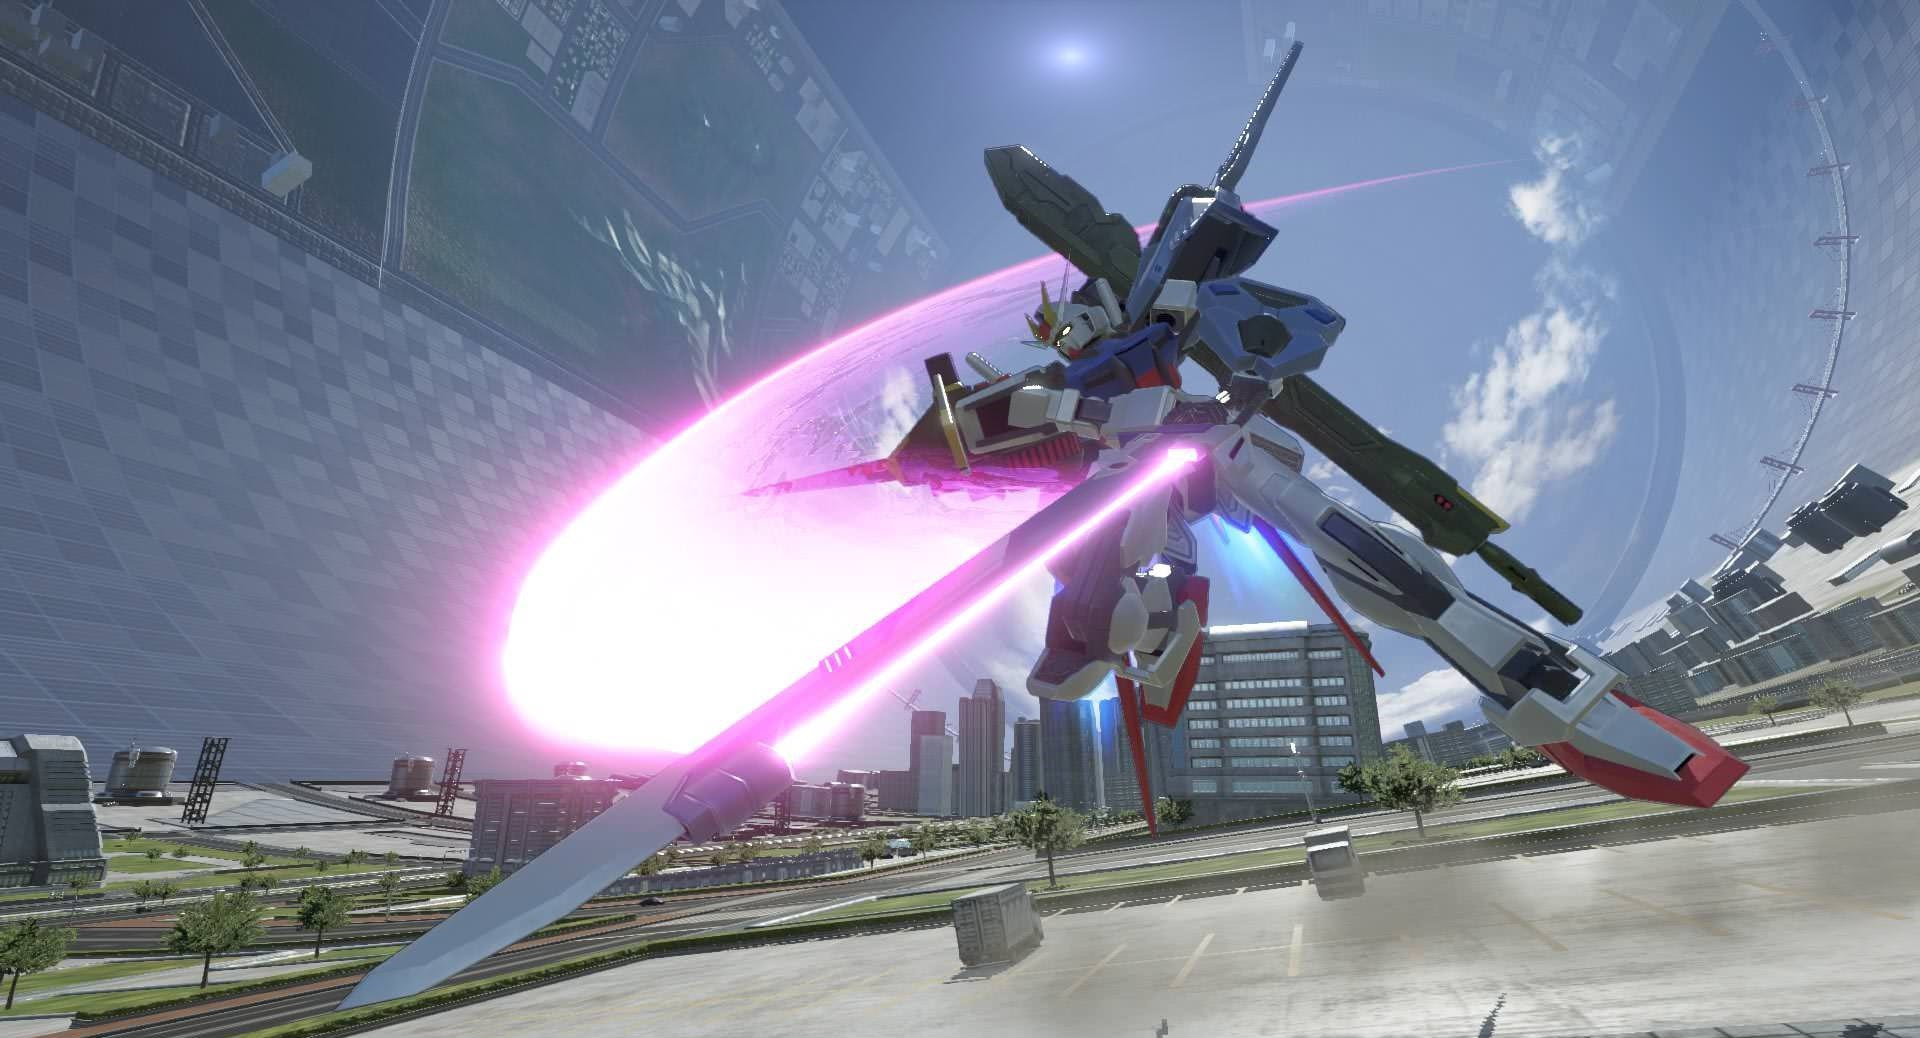 Gundam Versus launches Perfect Strike, Gusion Rebake and more as DLC screenshot